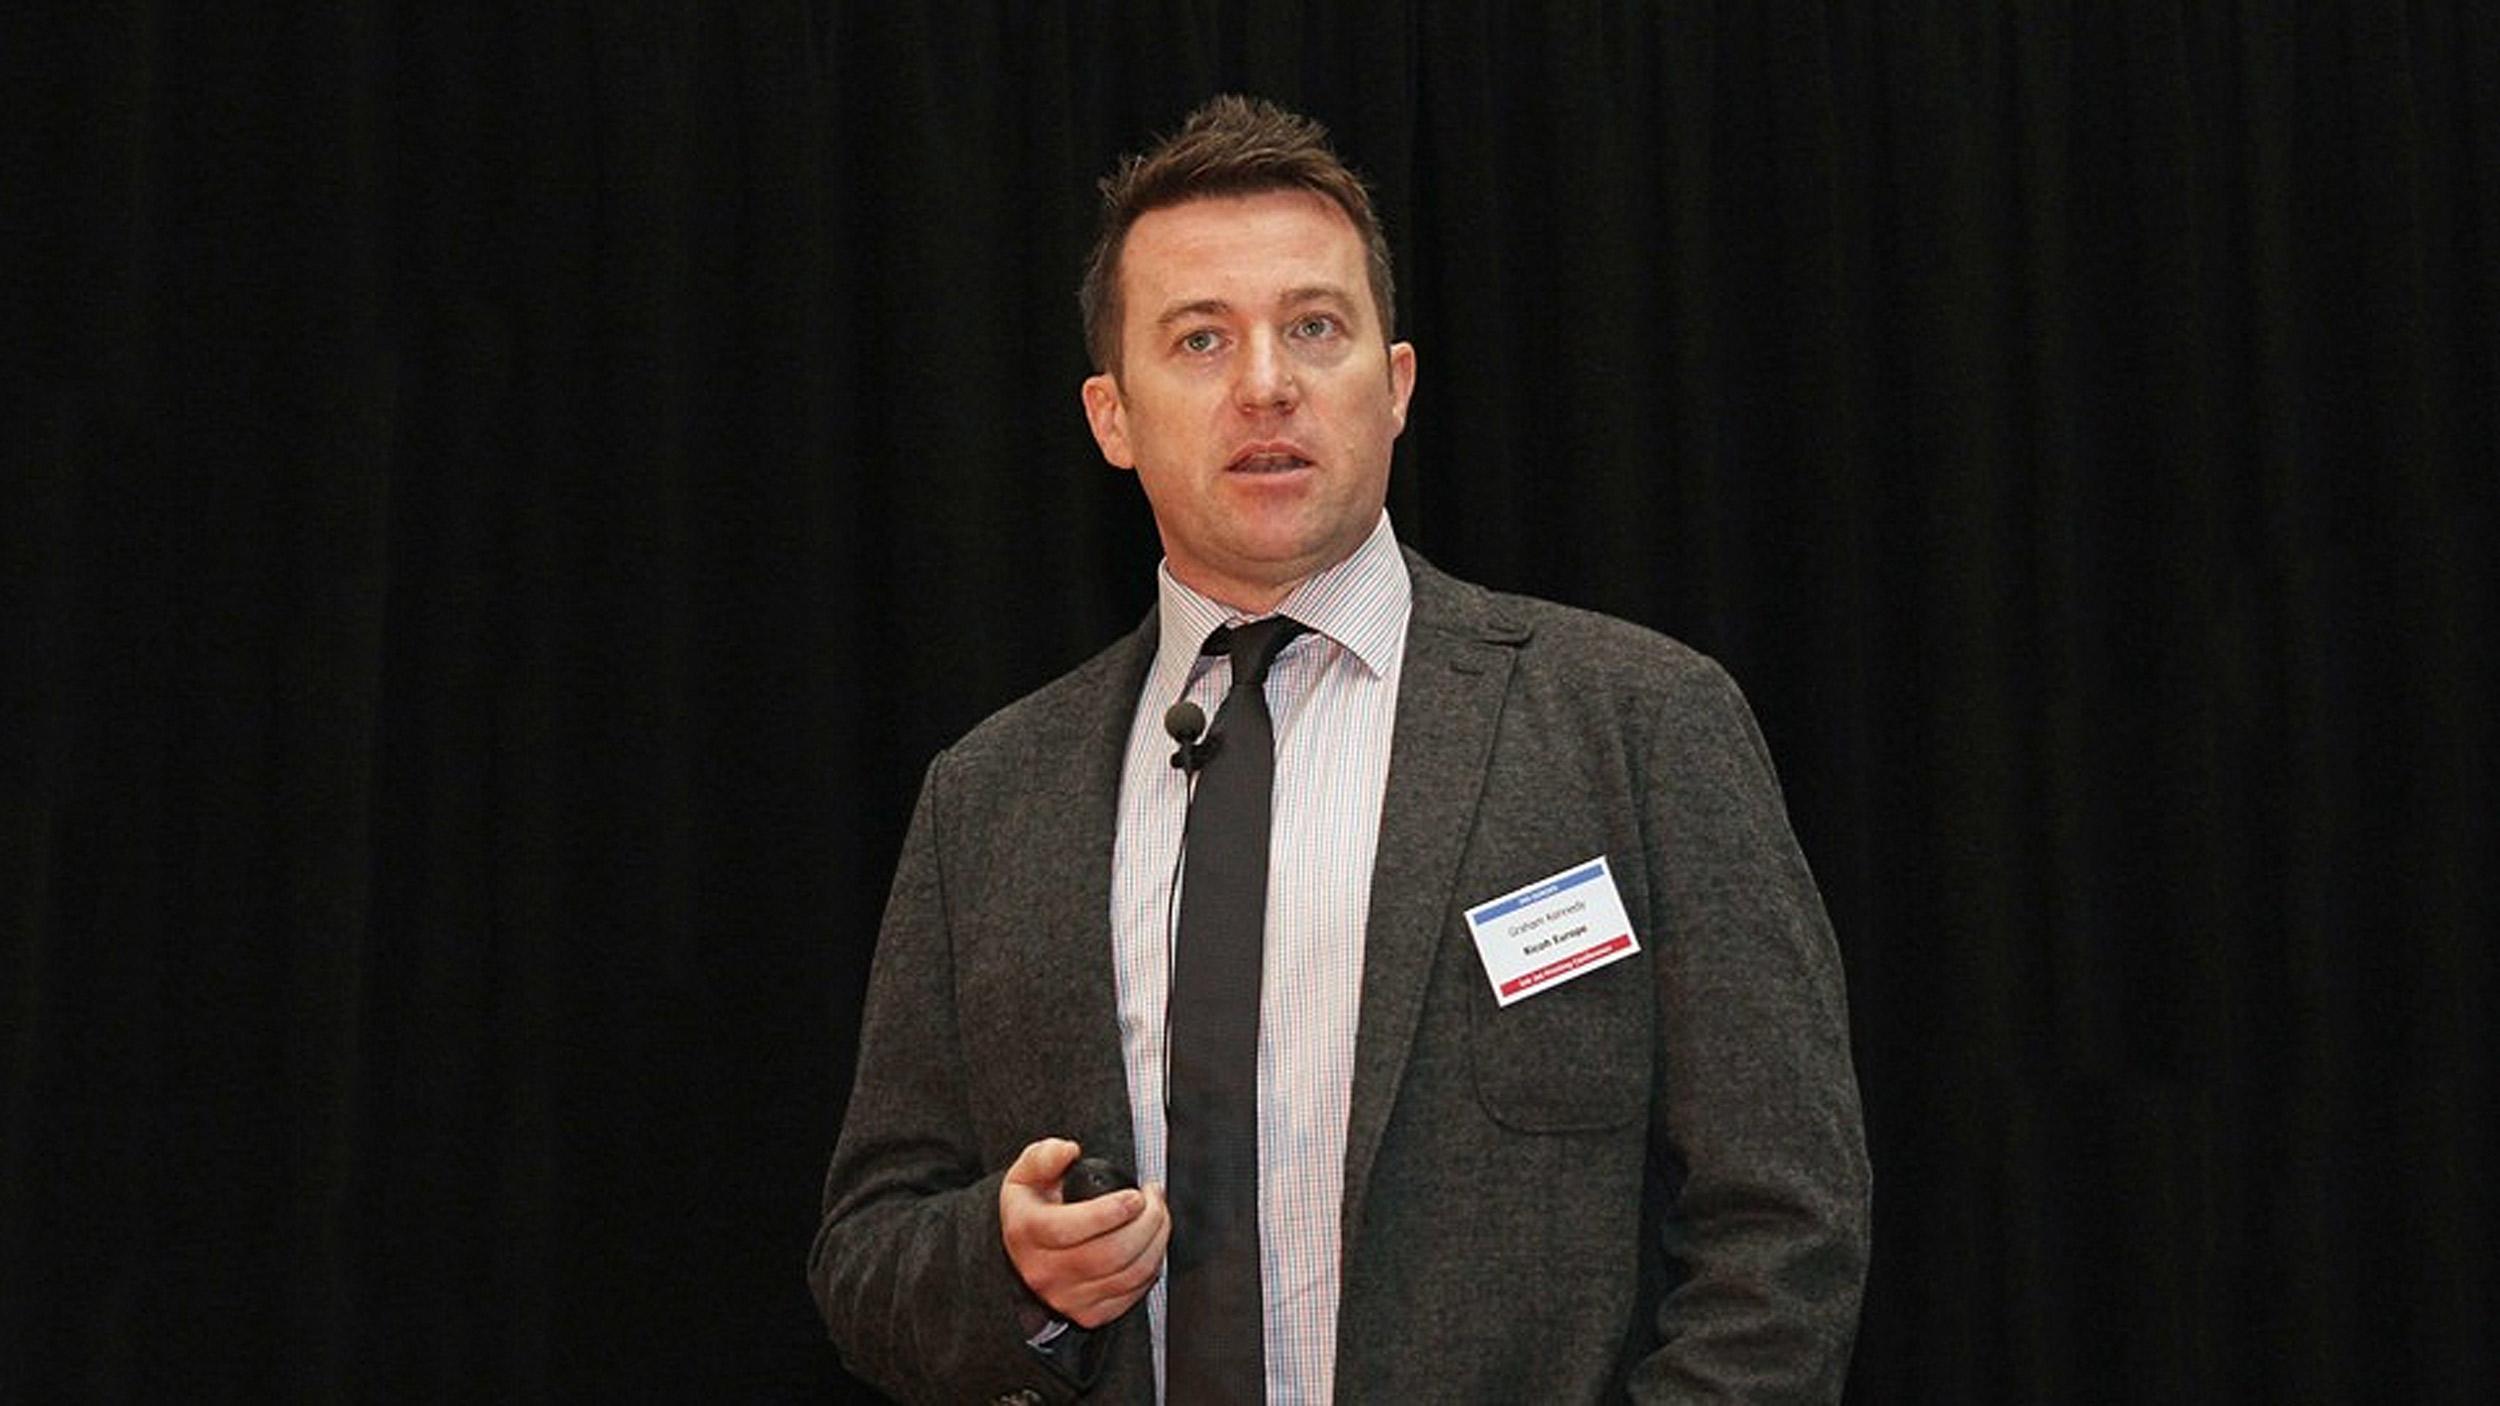 Graham Kennedy, Head of Commercial Inkjet Business